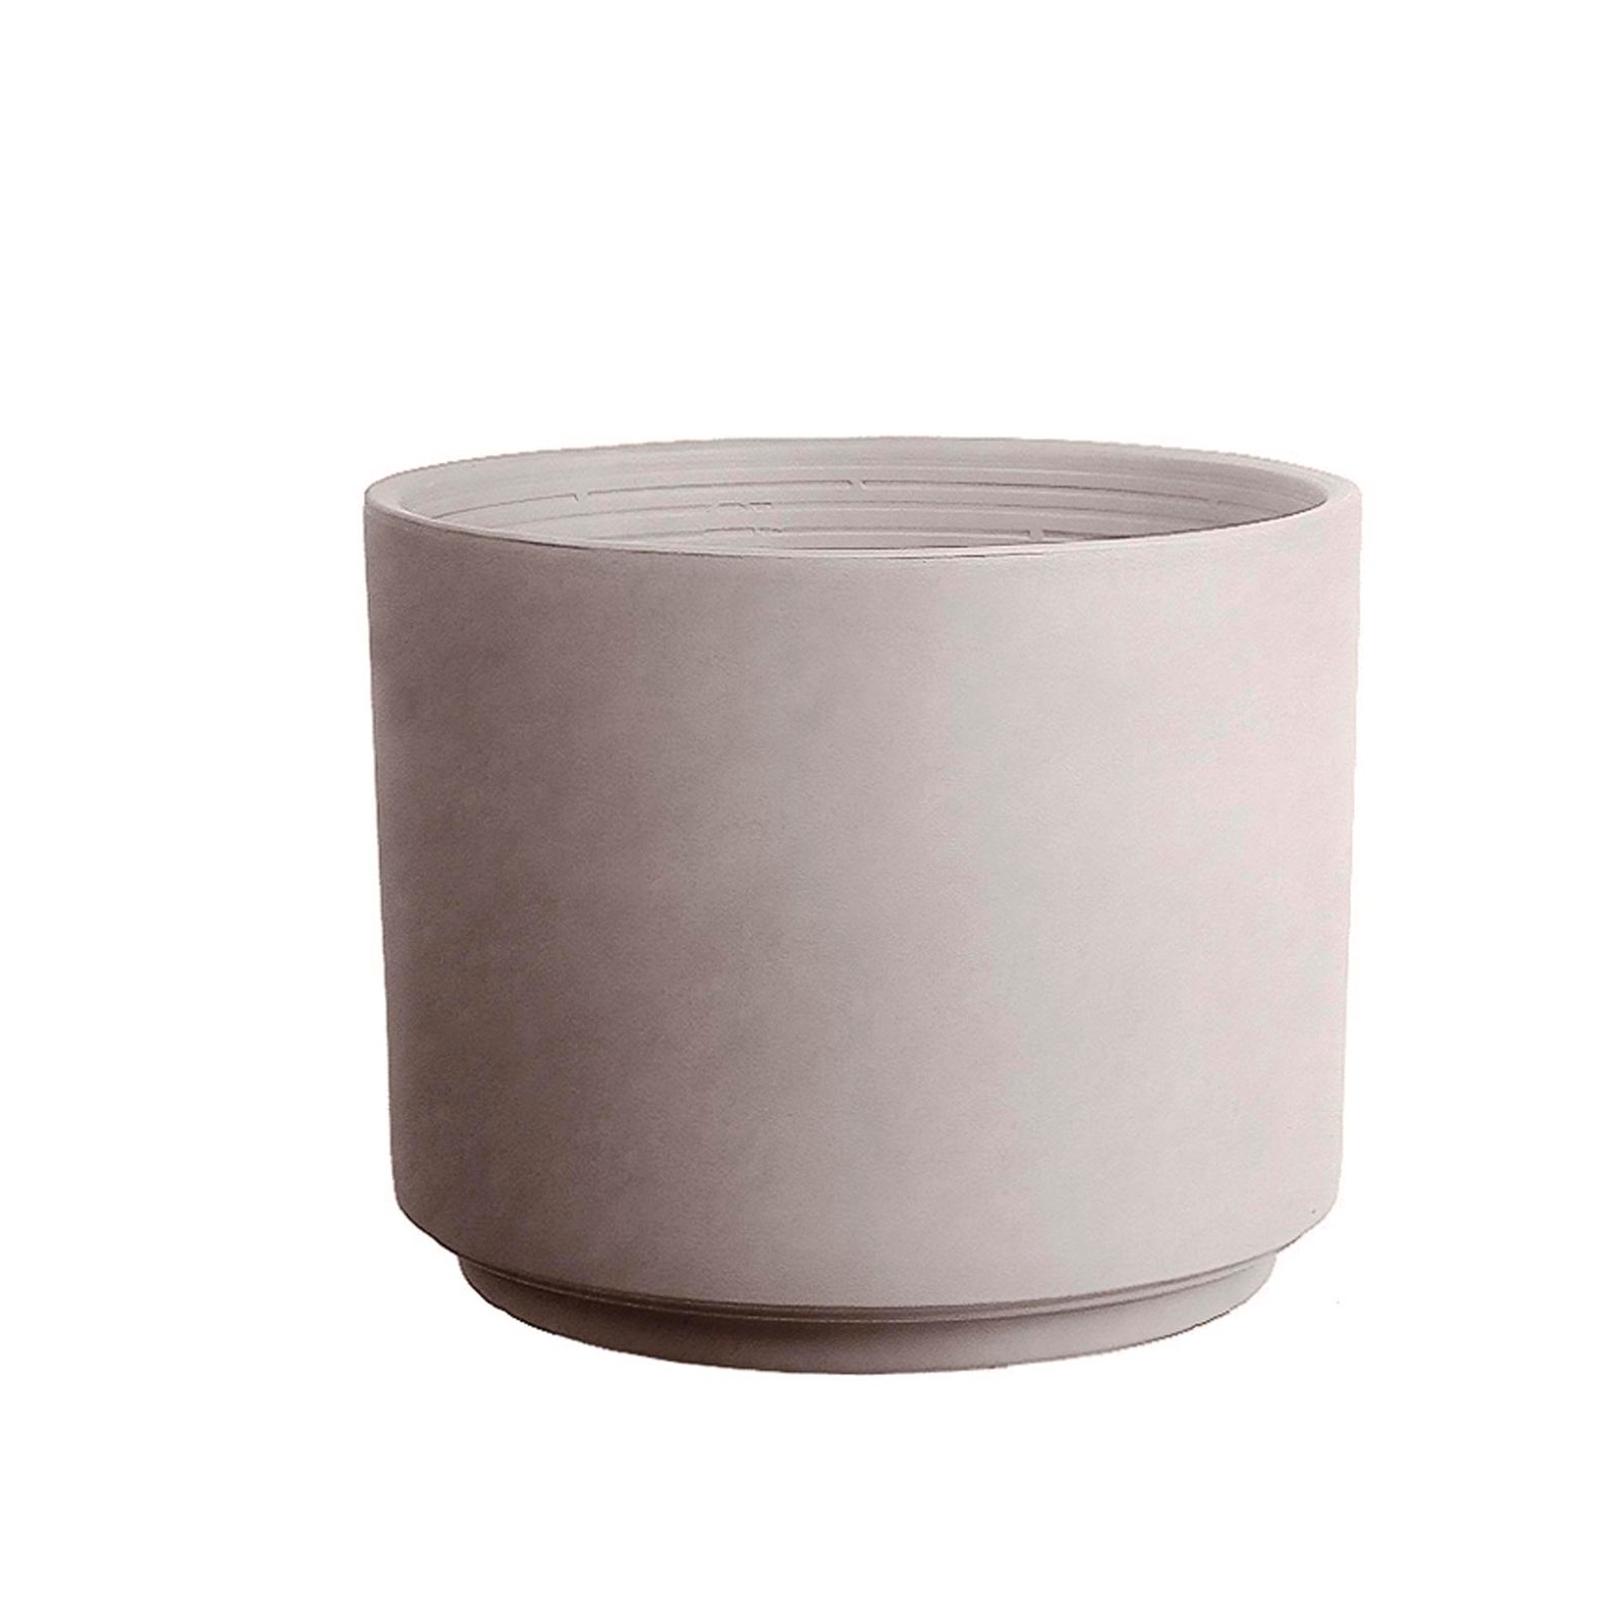 Northcote Pottery 25cm Italian Greige Terracotta Cylinder Pot